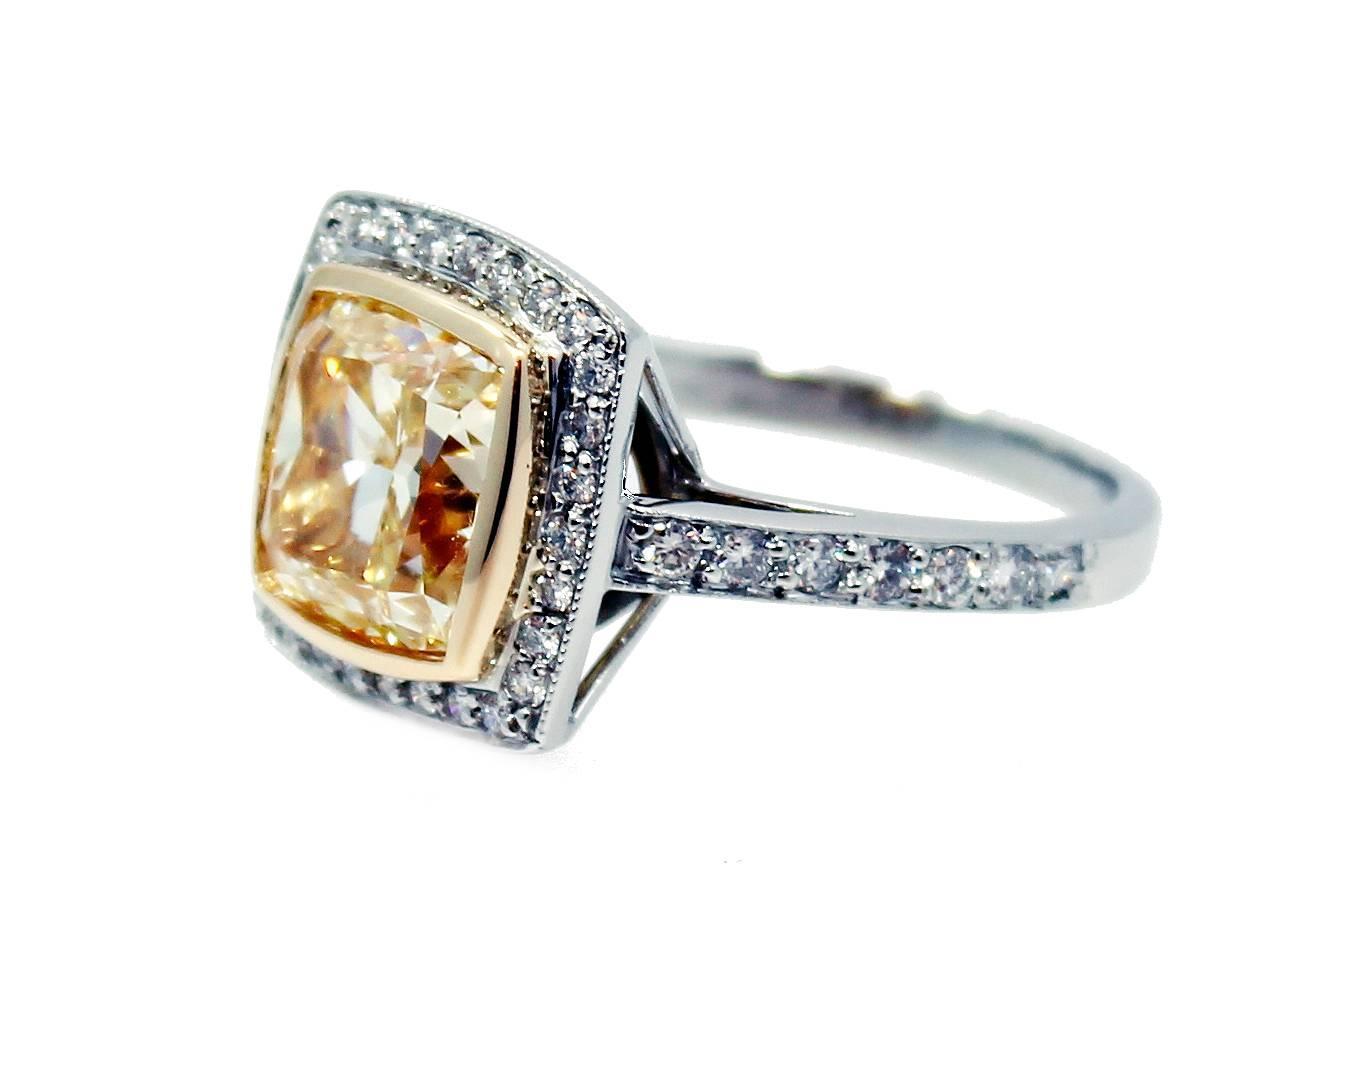 5 55 carat fancy light yellow radiant gold